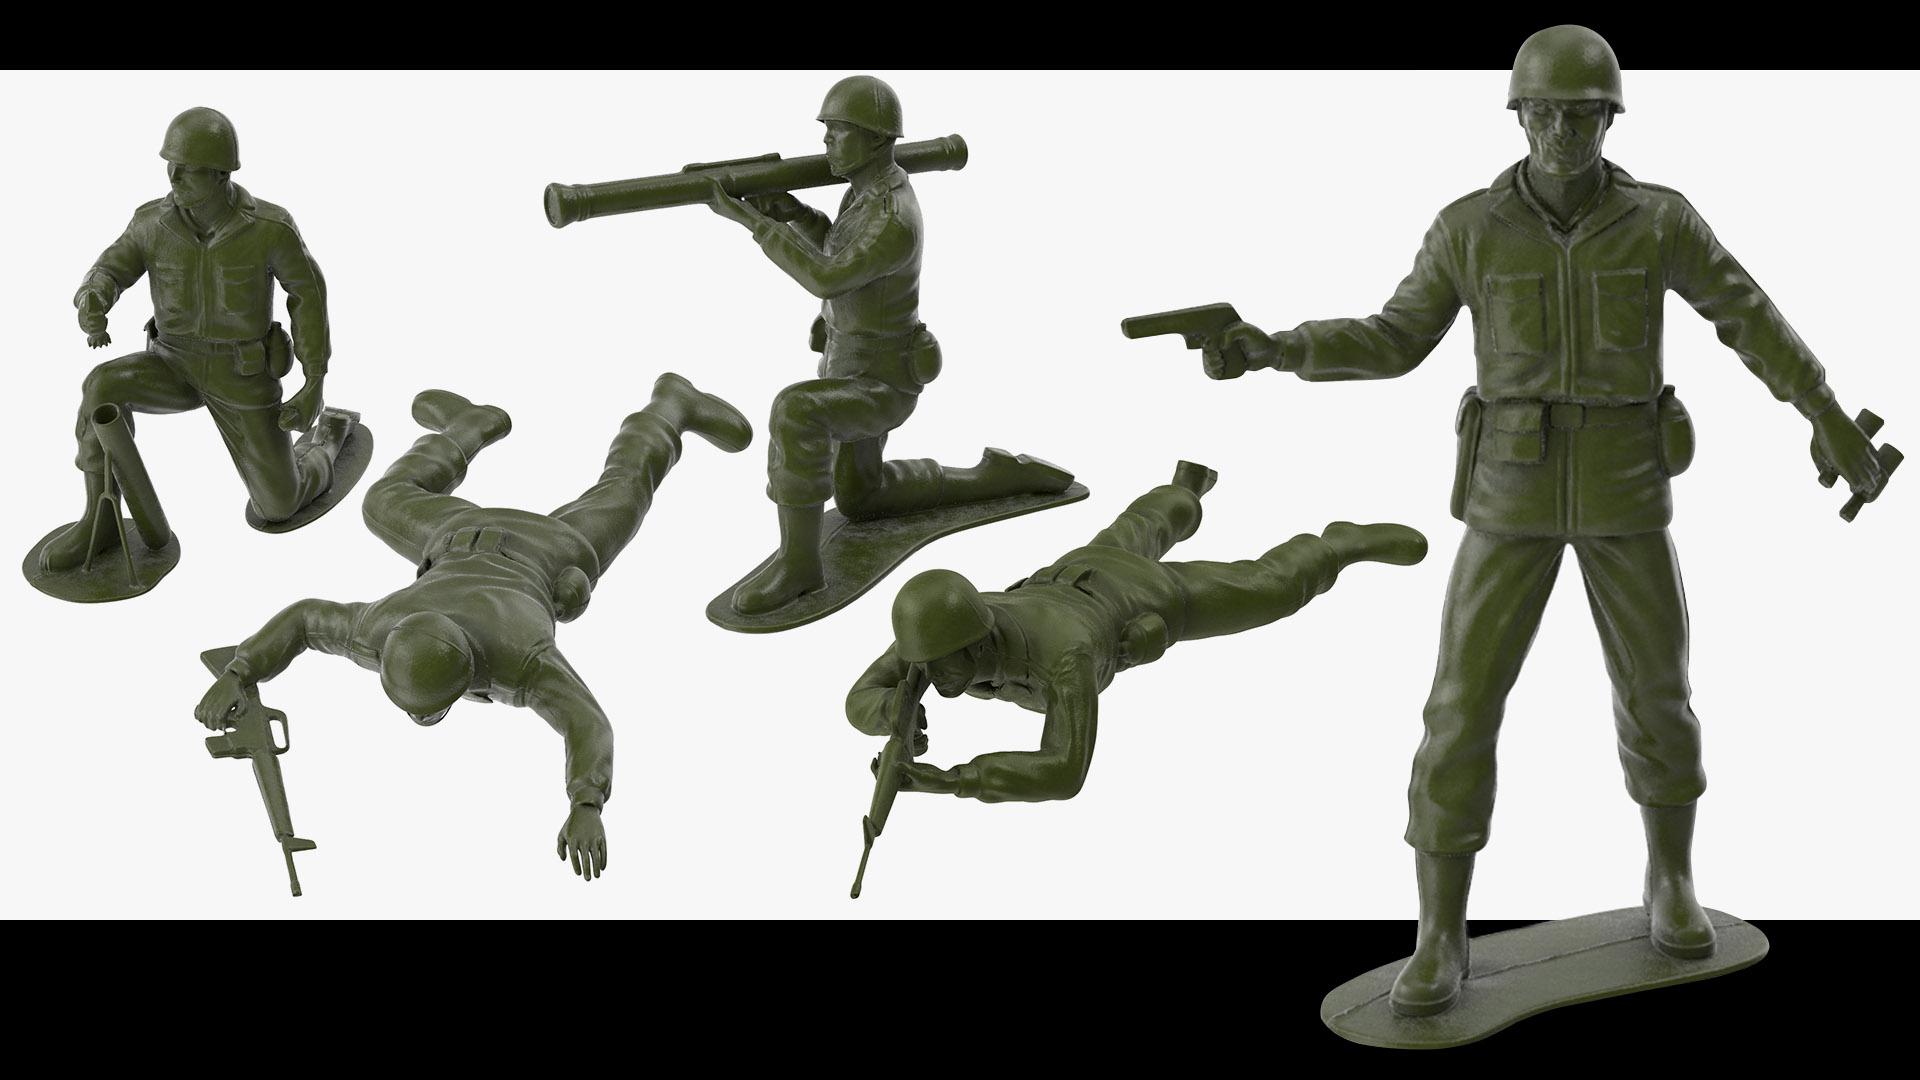 Plastic Toy Soldiers 3D Models